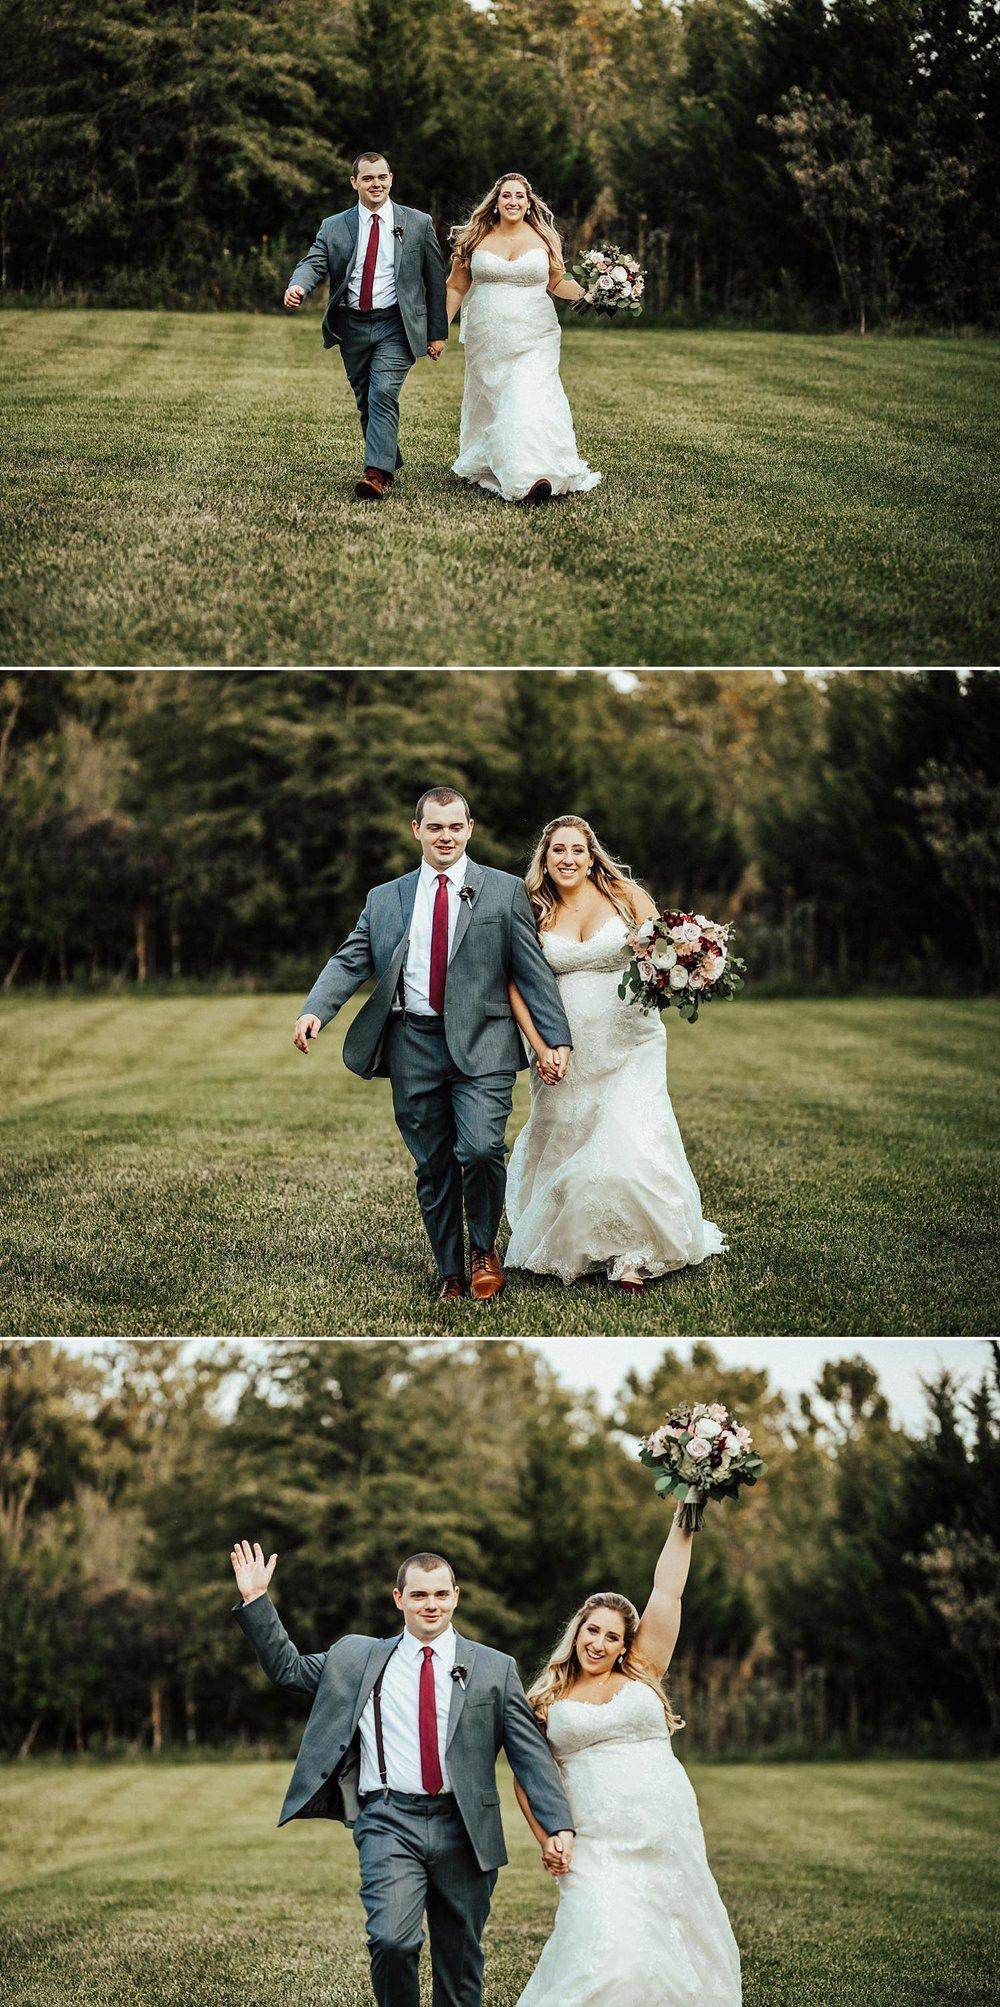 kansas-city-autumn-backyard-wedding-122.jpg